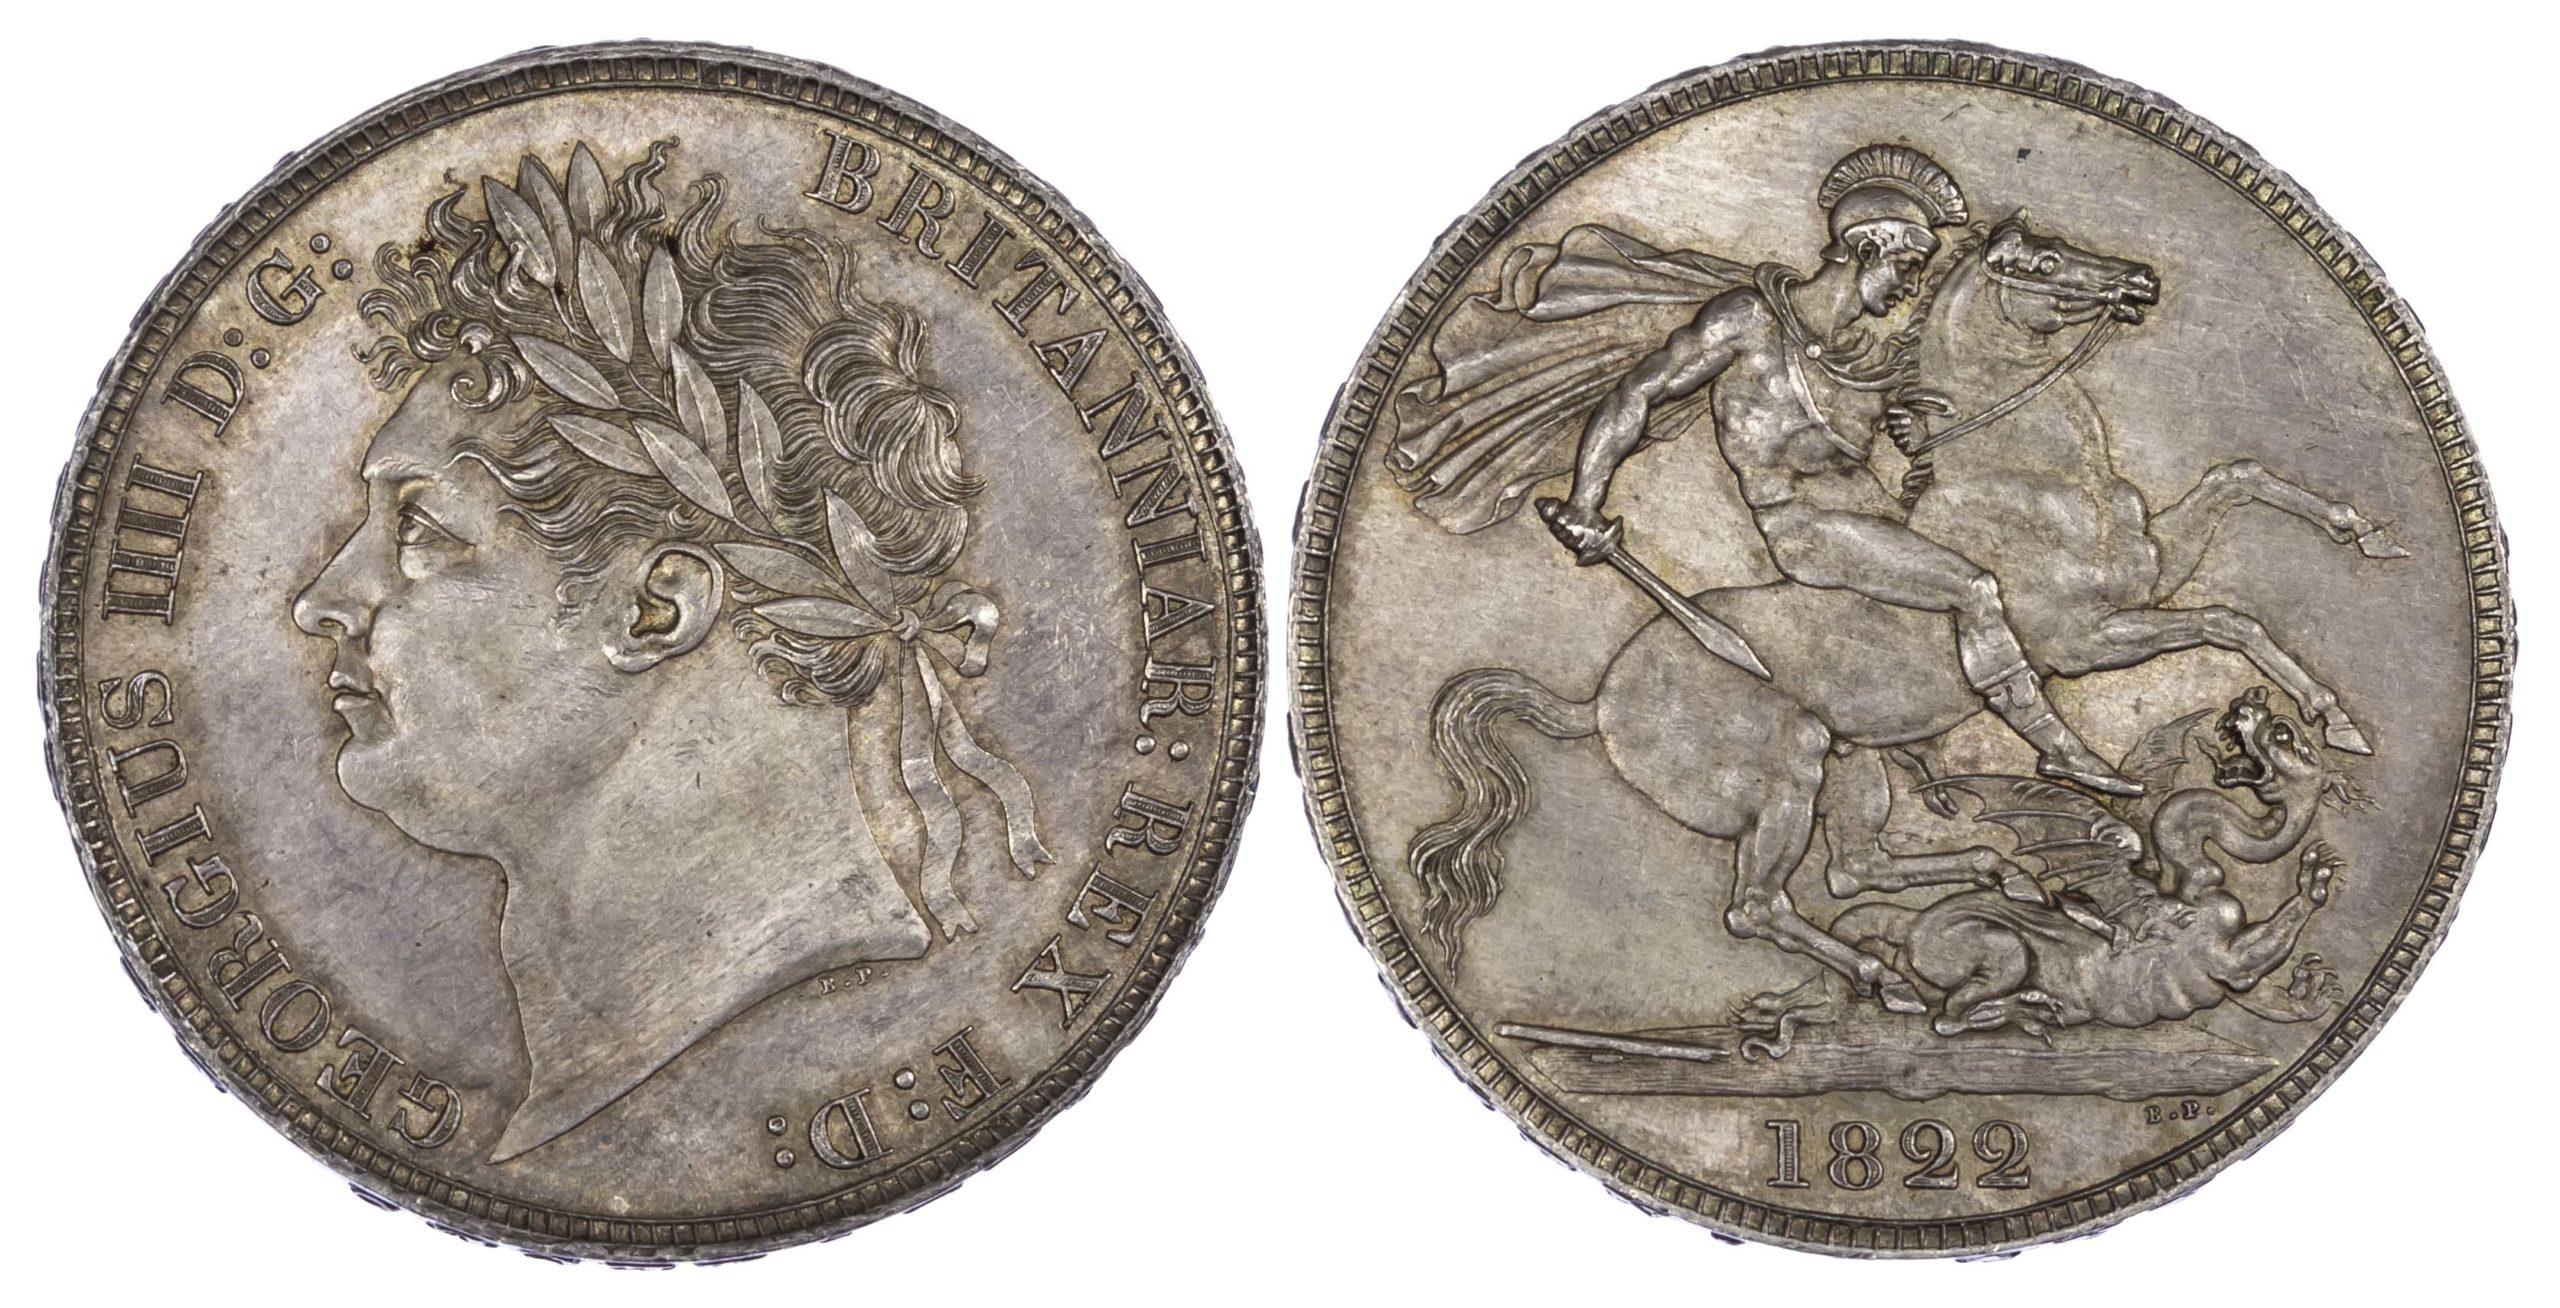 George IV (1820-30), Crown, 1822, Laureate head, Secundo edge